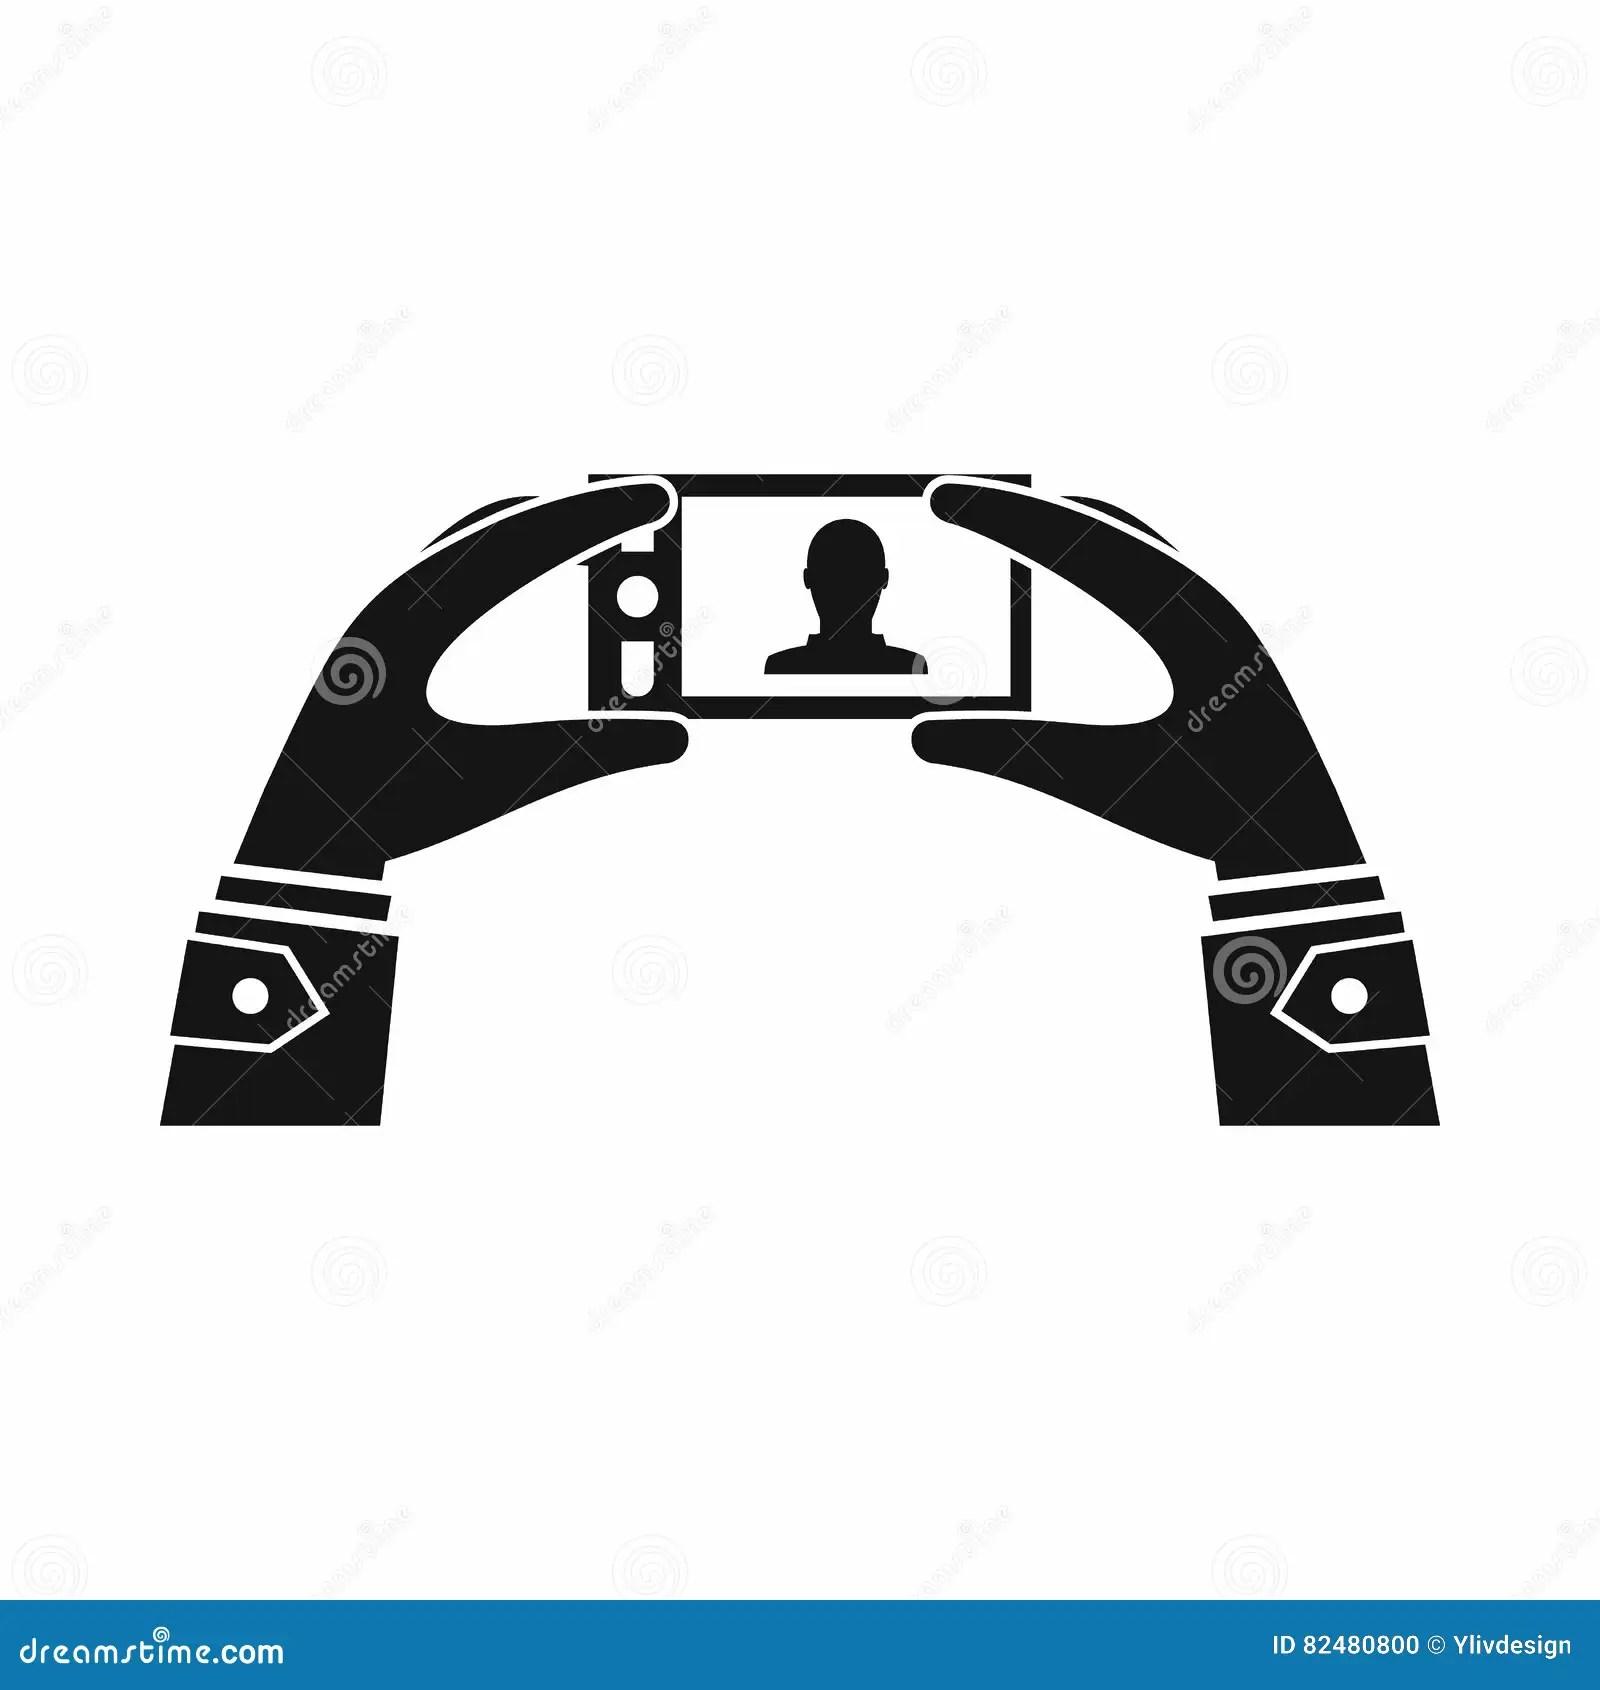 Door Switch Symbol & Hand / Gate Symbol Door Exit Push